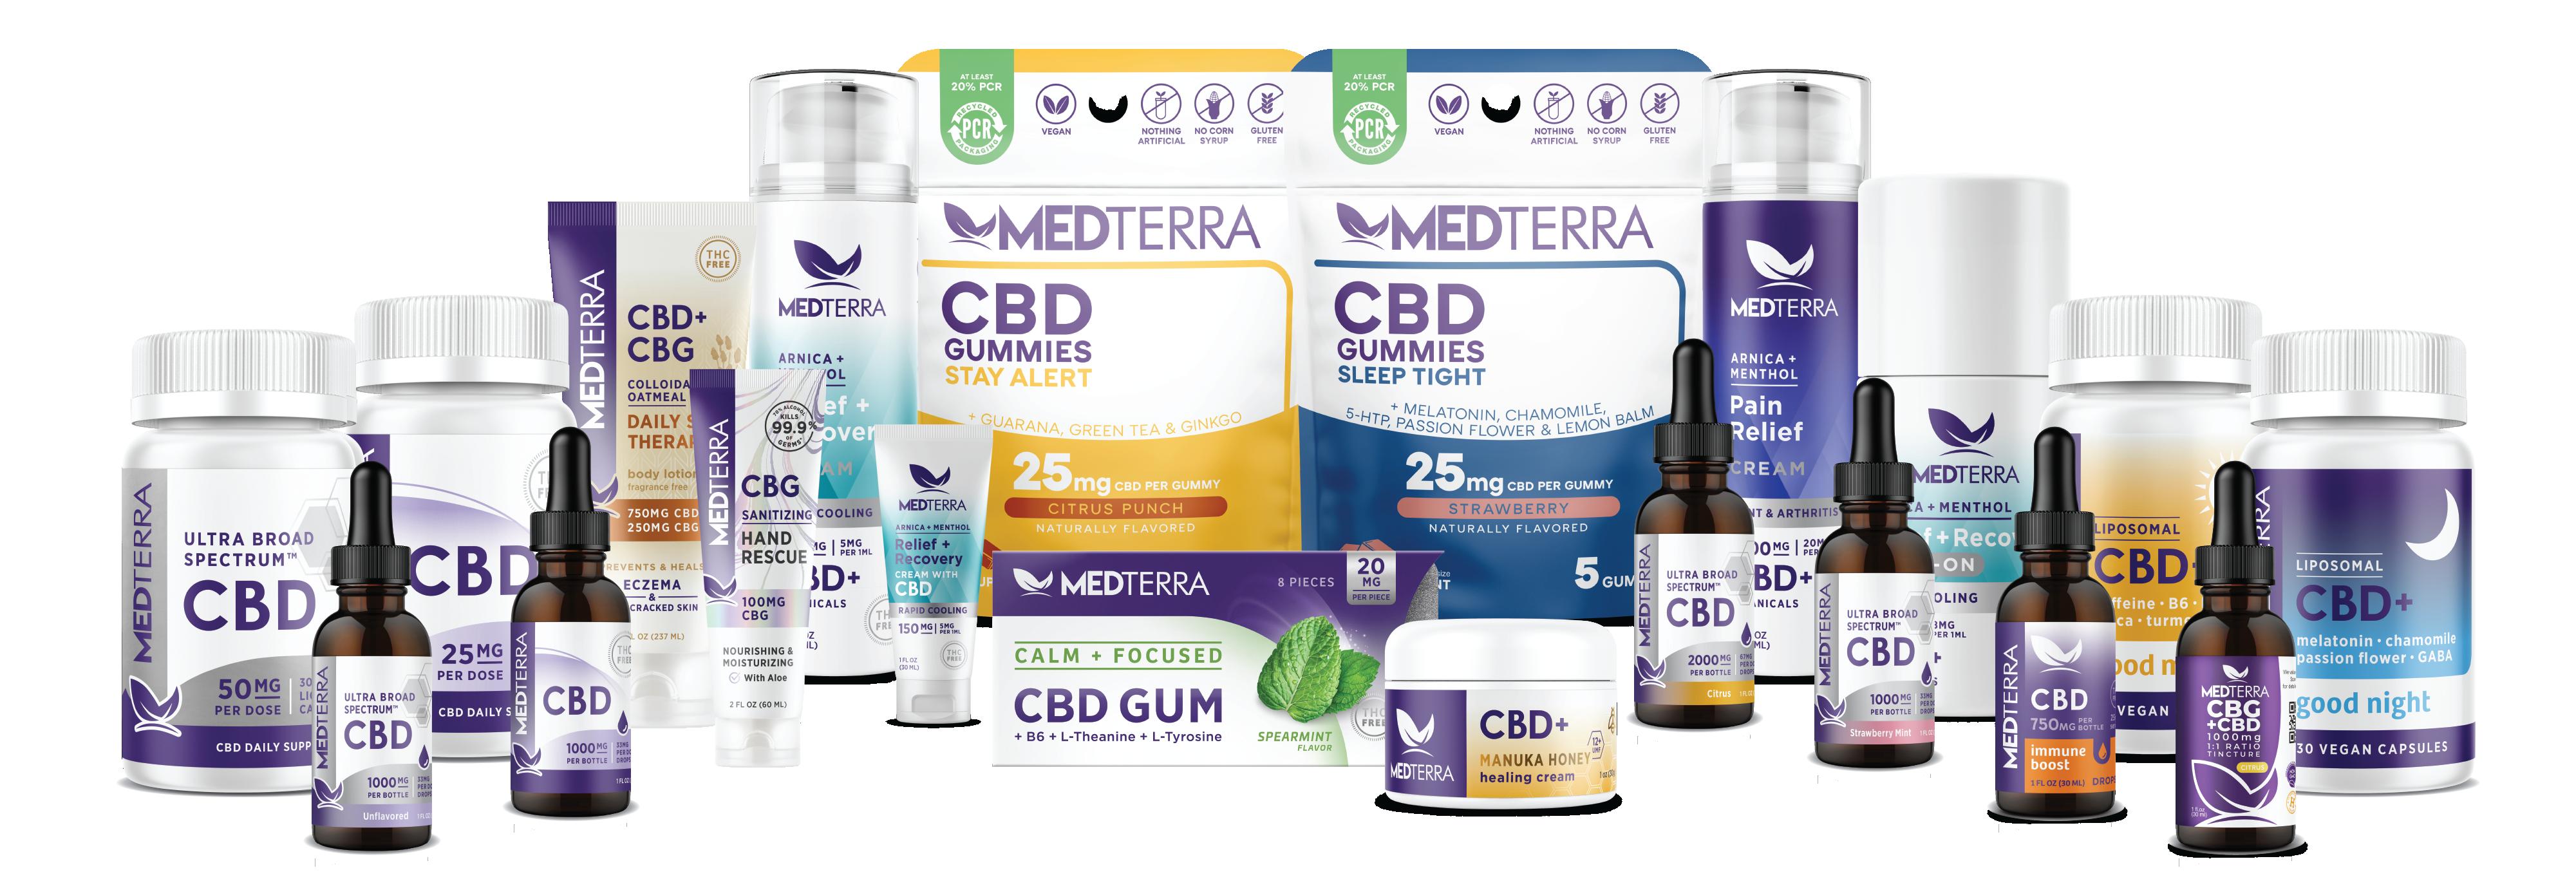 Medterra CBD capsules oil review 2021